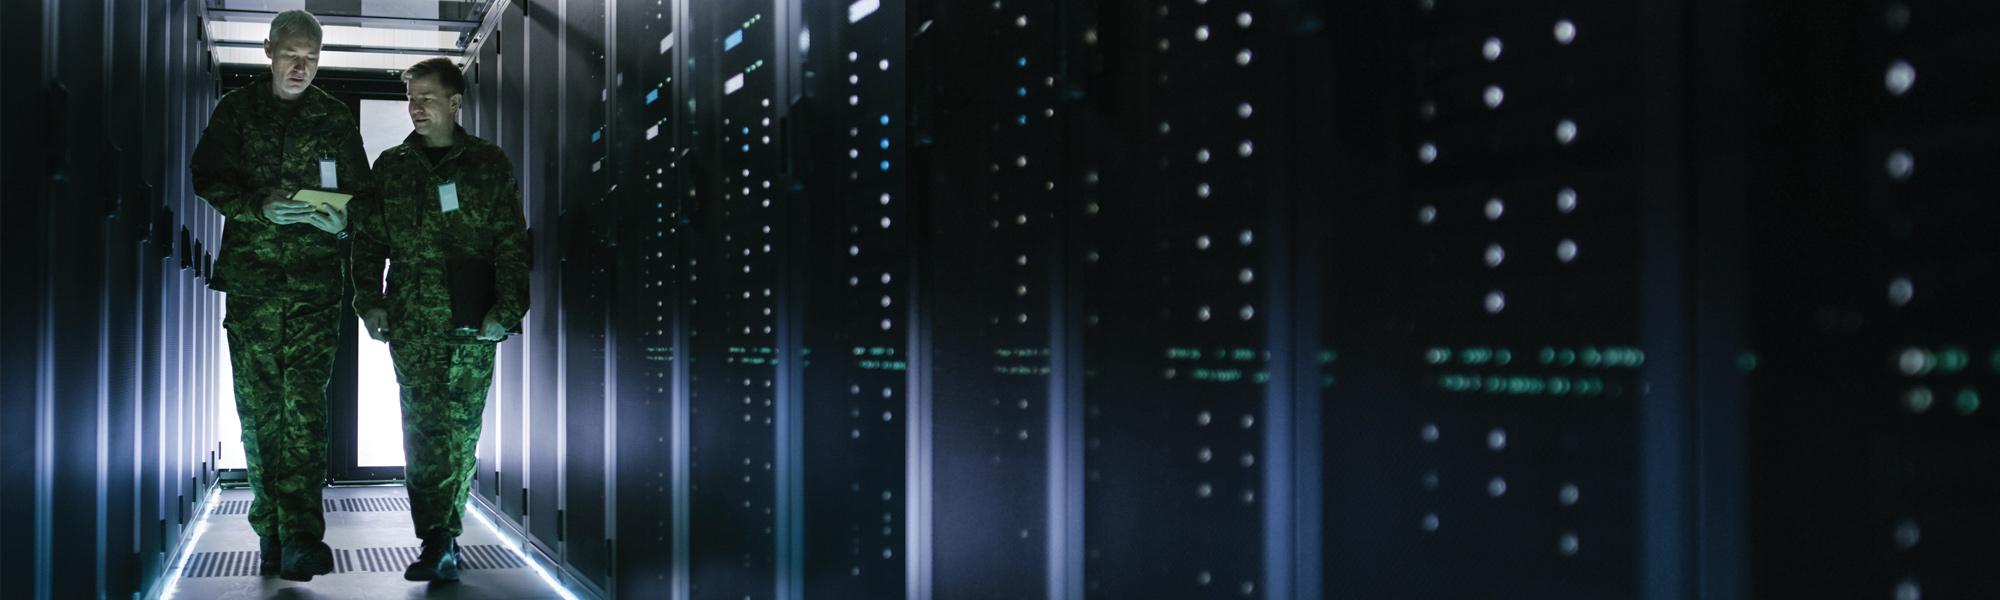 Lifecycle Management Image - Walking through servers